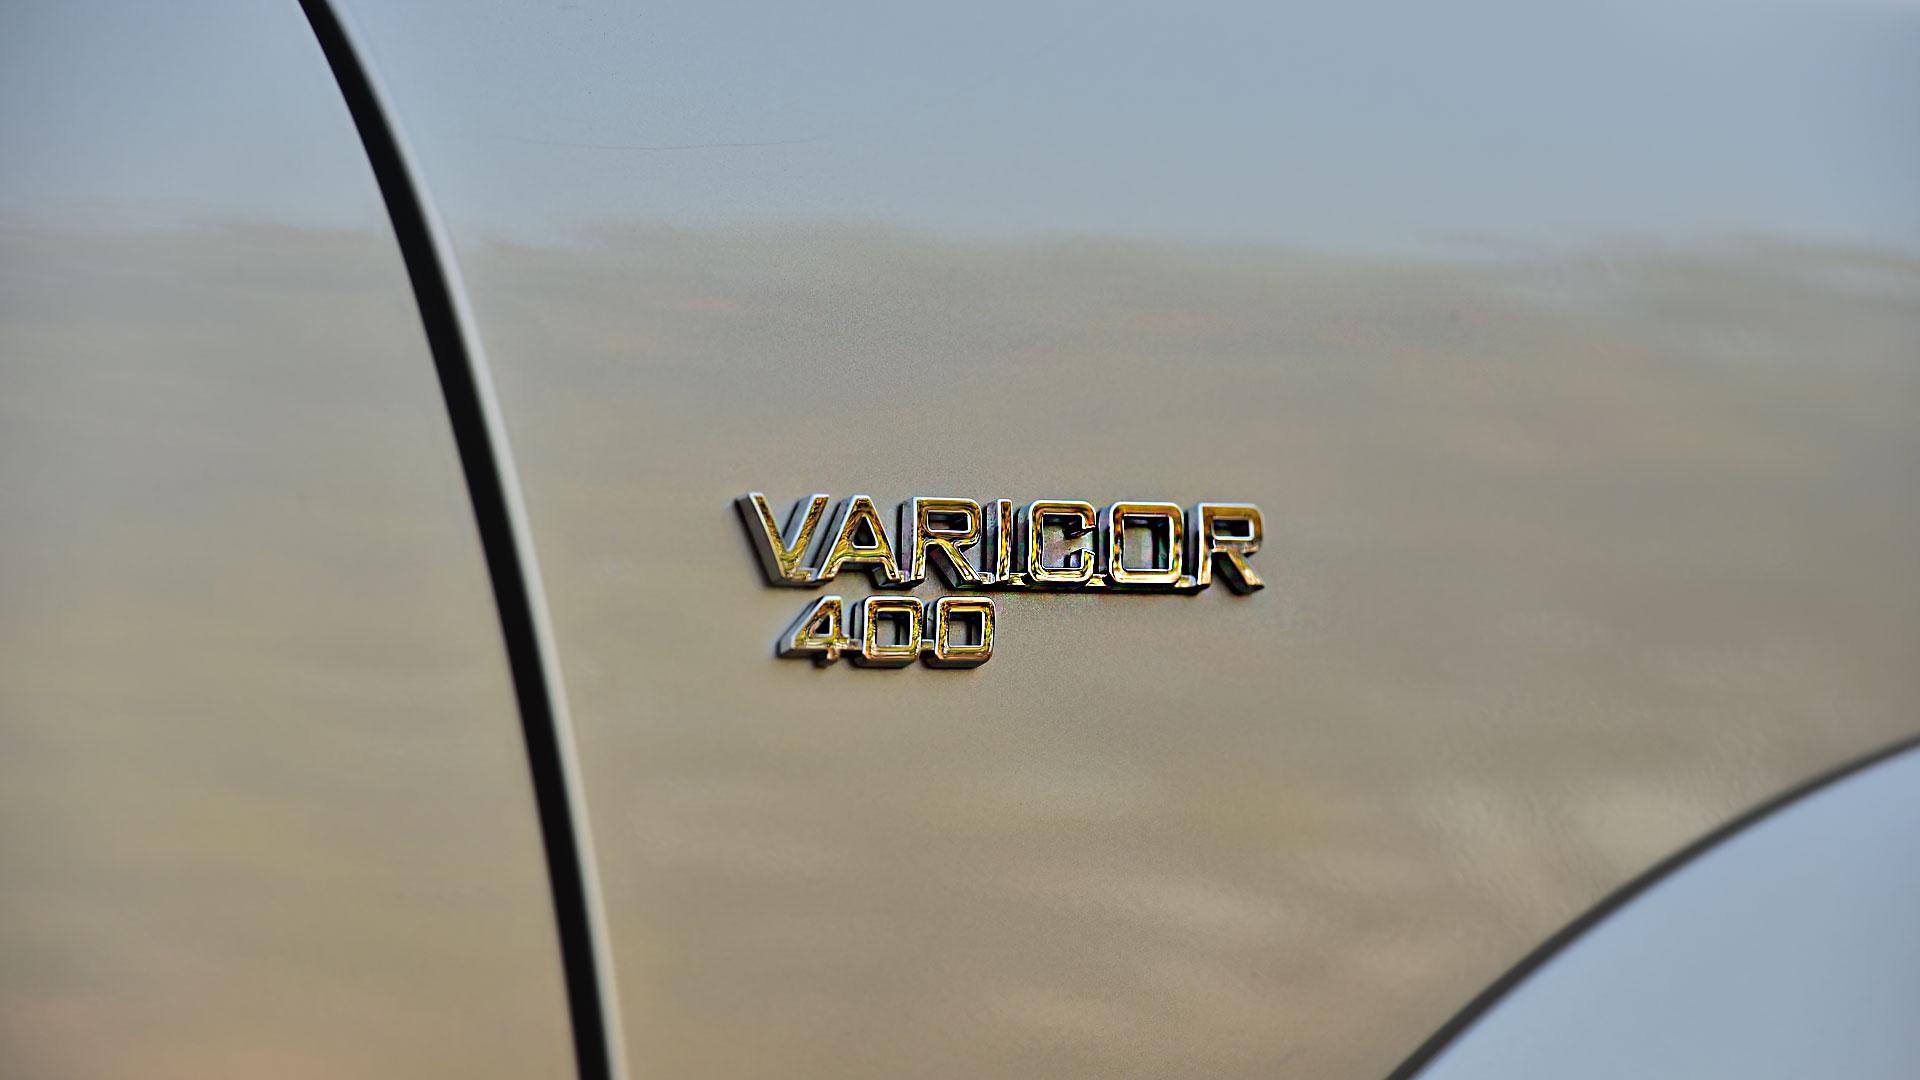 Tata Safari Storme 2016 VX BS4 4x4 Exterior